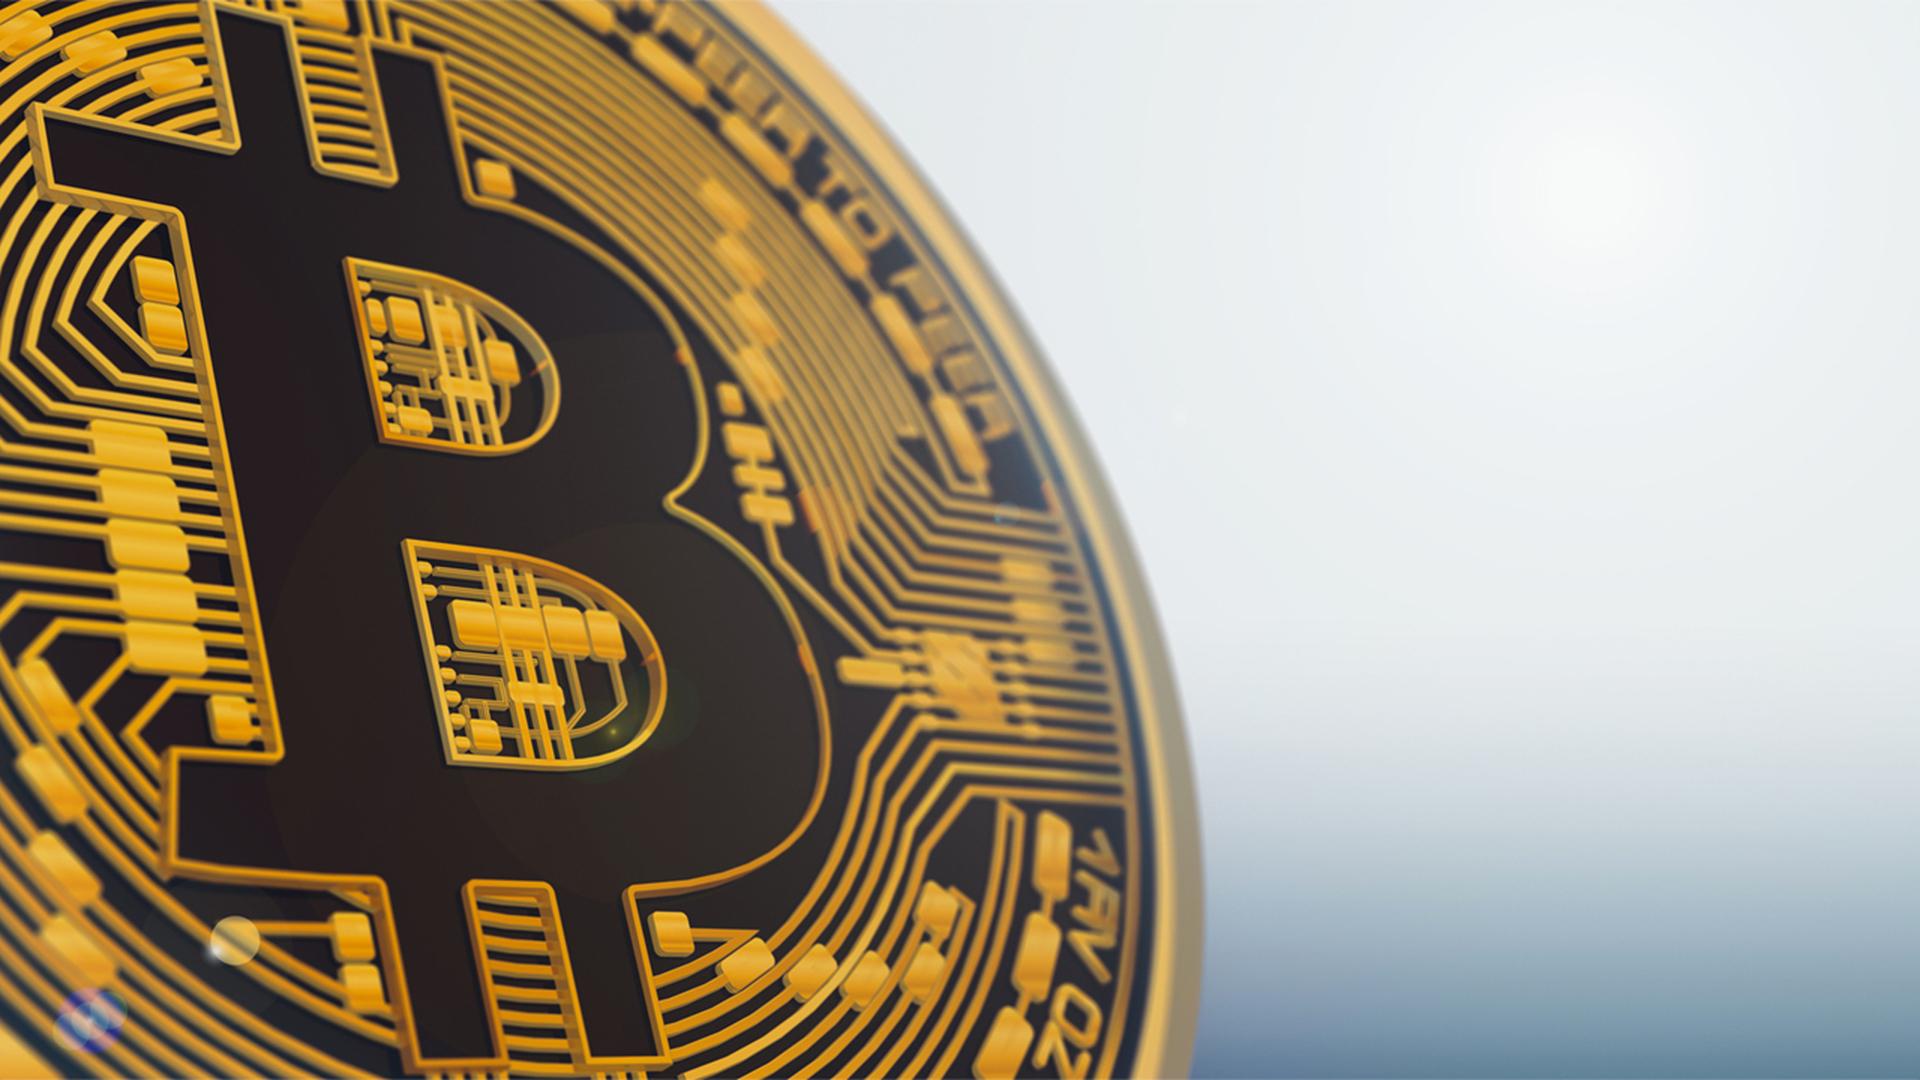 Генерирует биткоины курс фунта форекс онлайн график